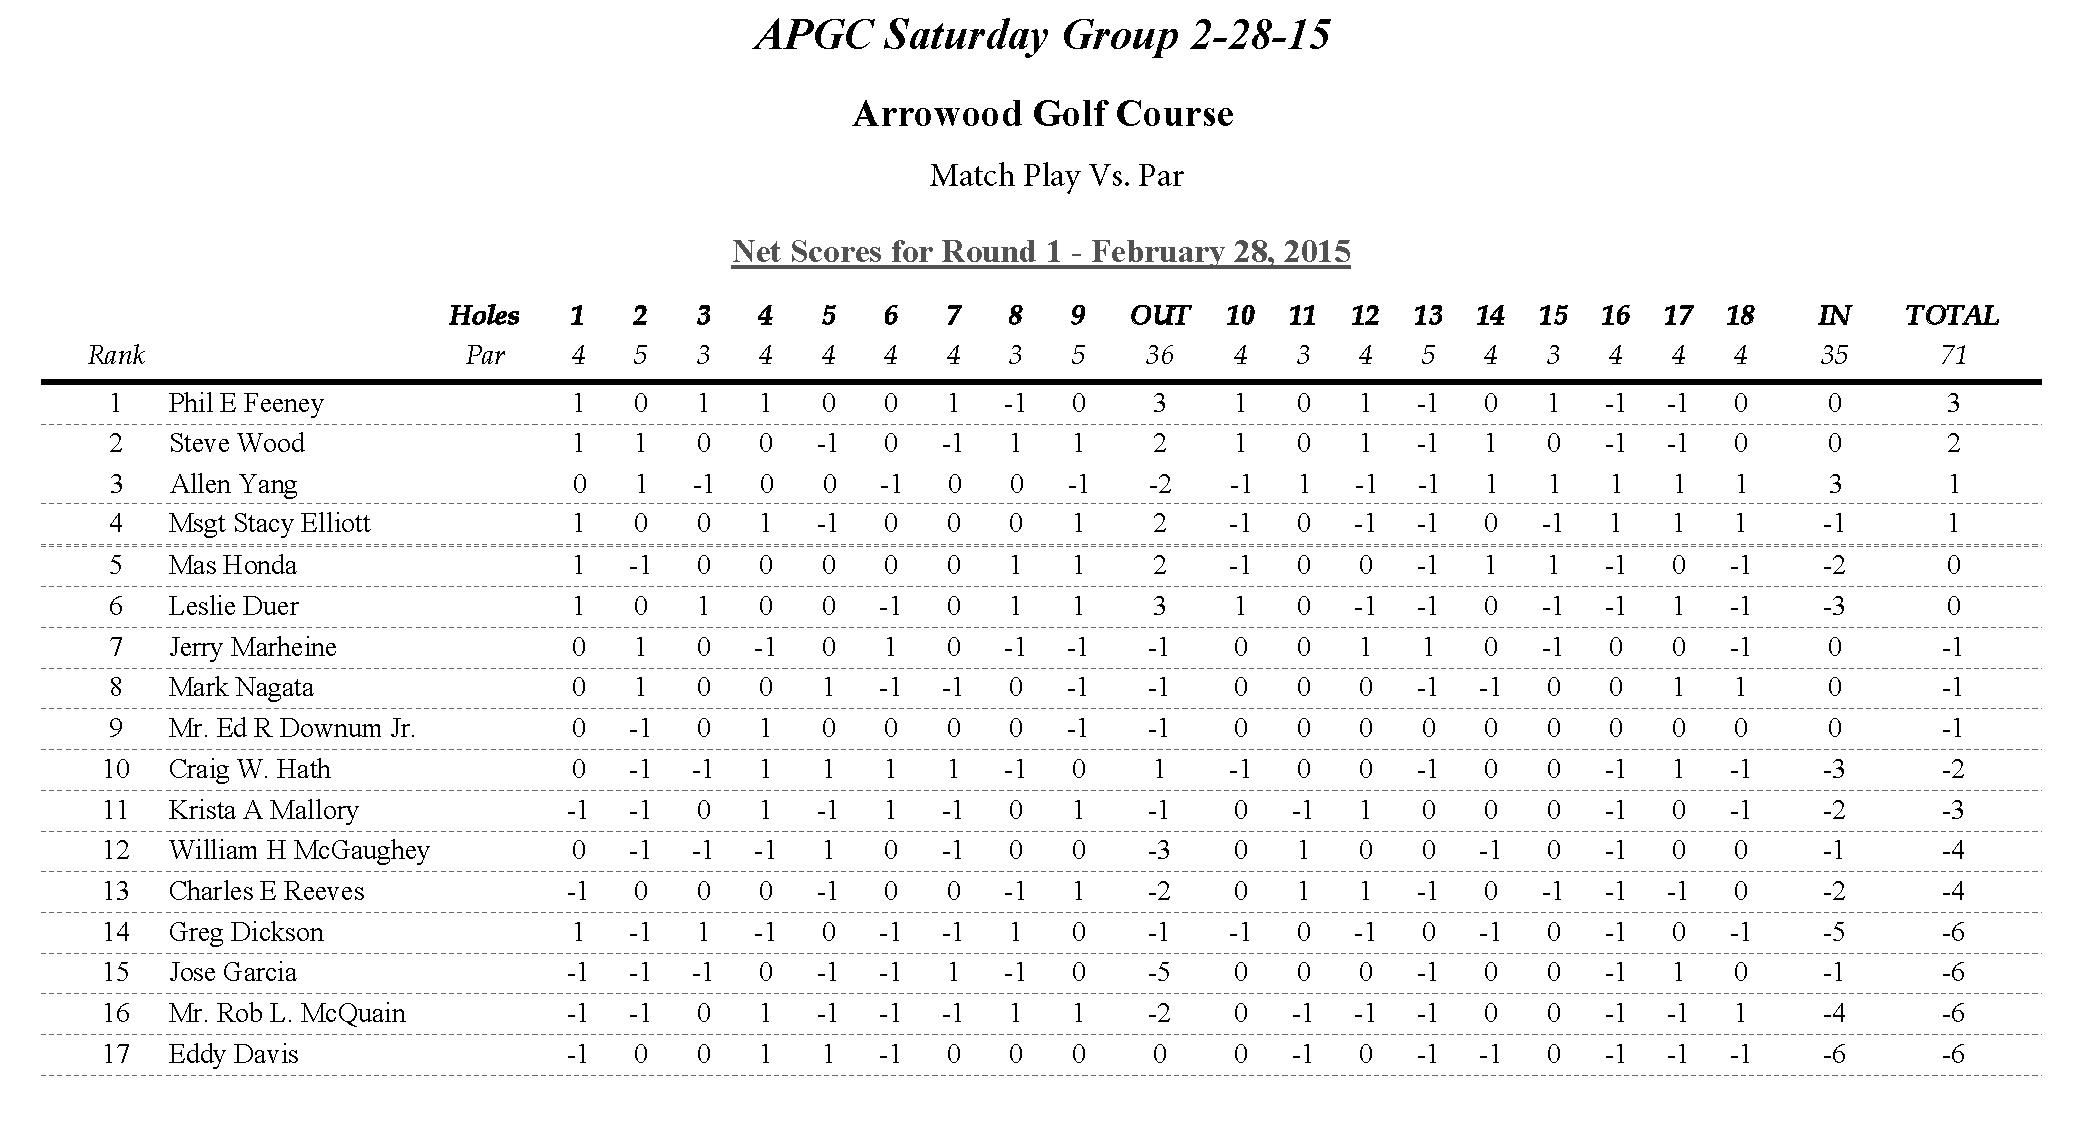 APGC Saturday 2-28-15